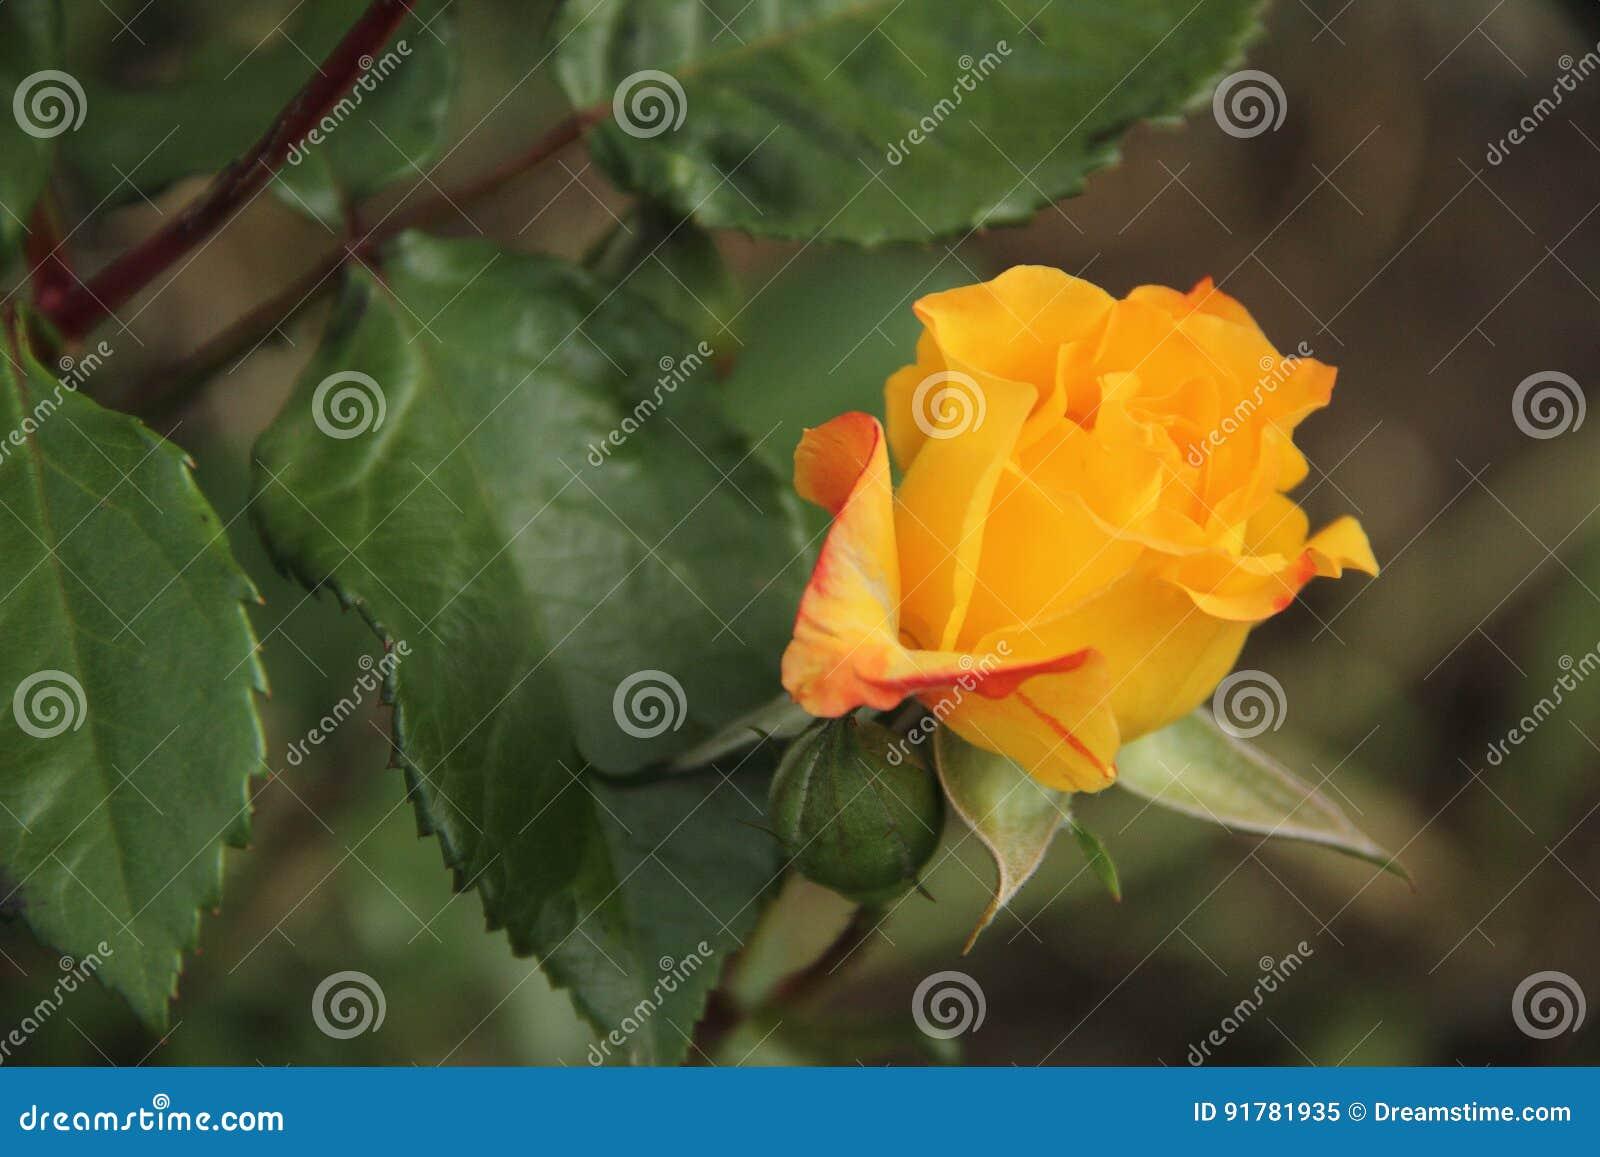 Beautiful yellow orange rose flower in the garden